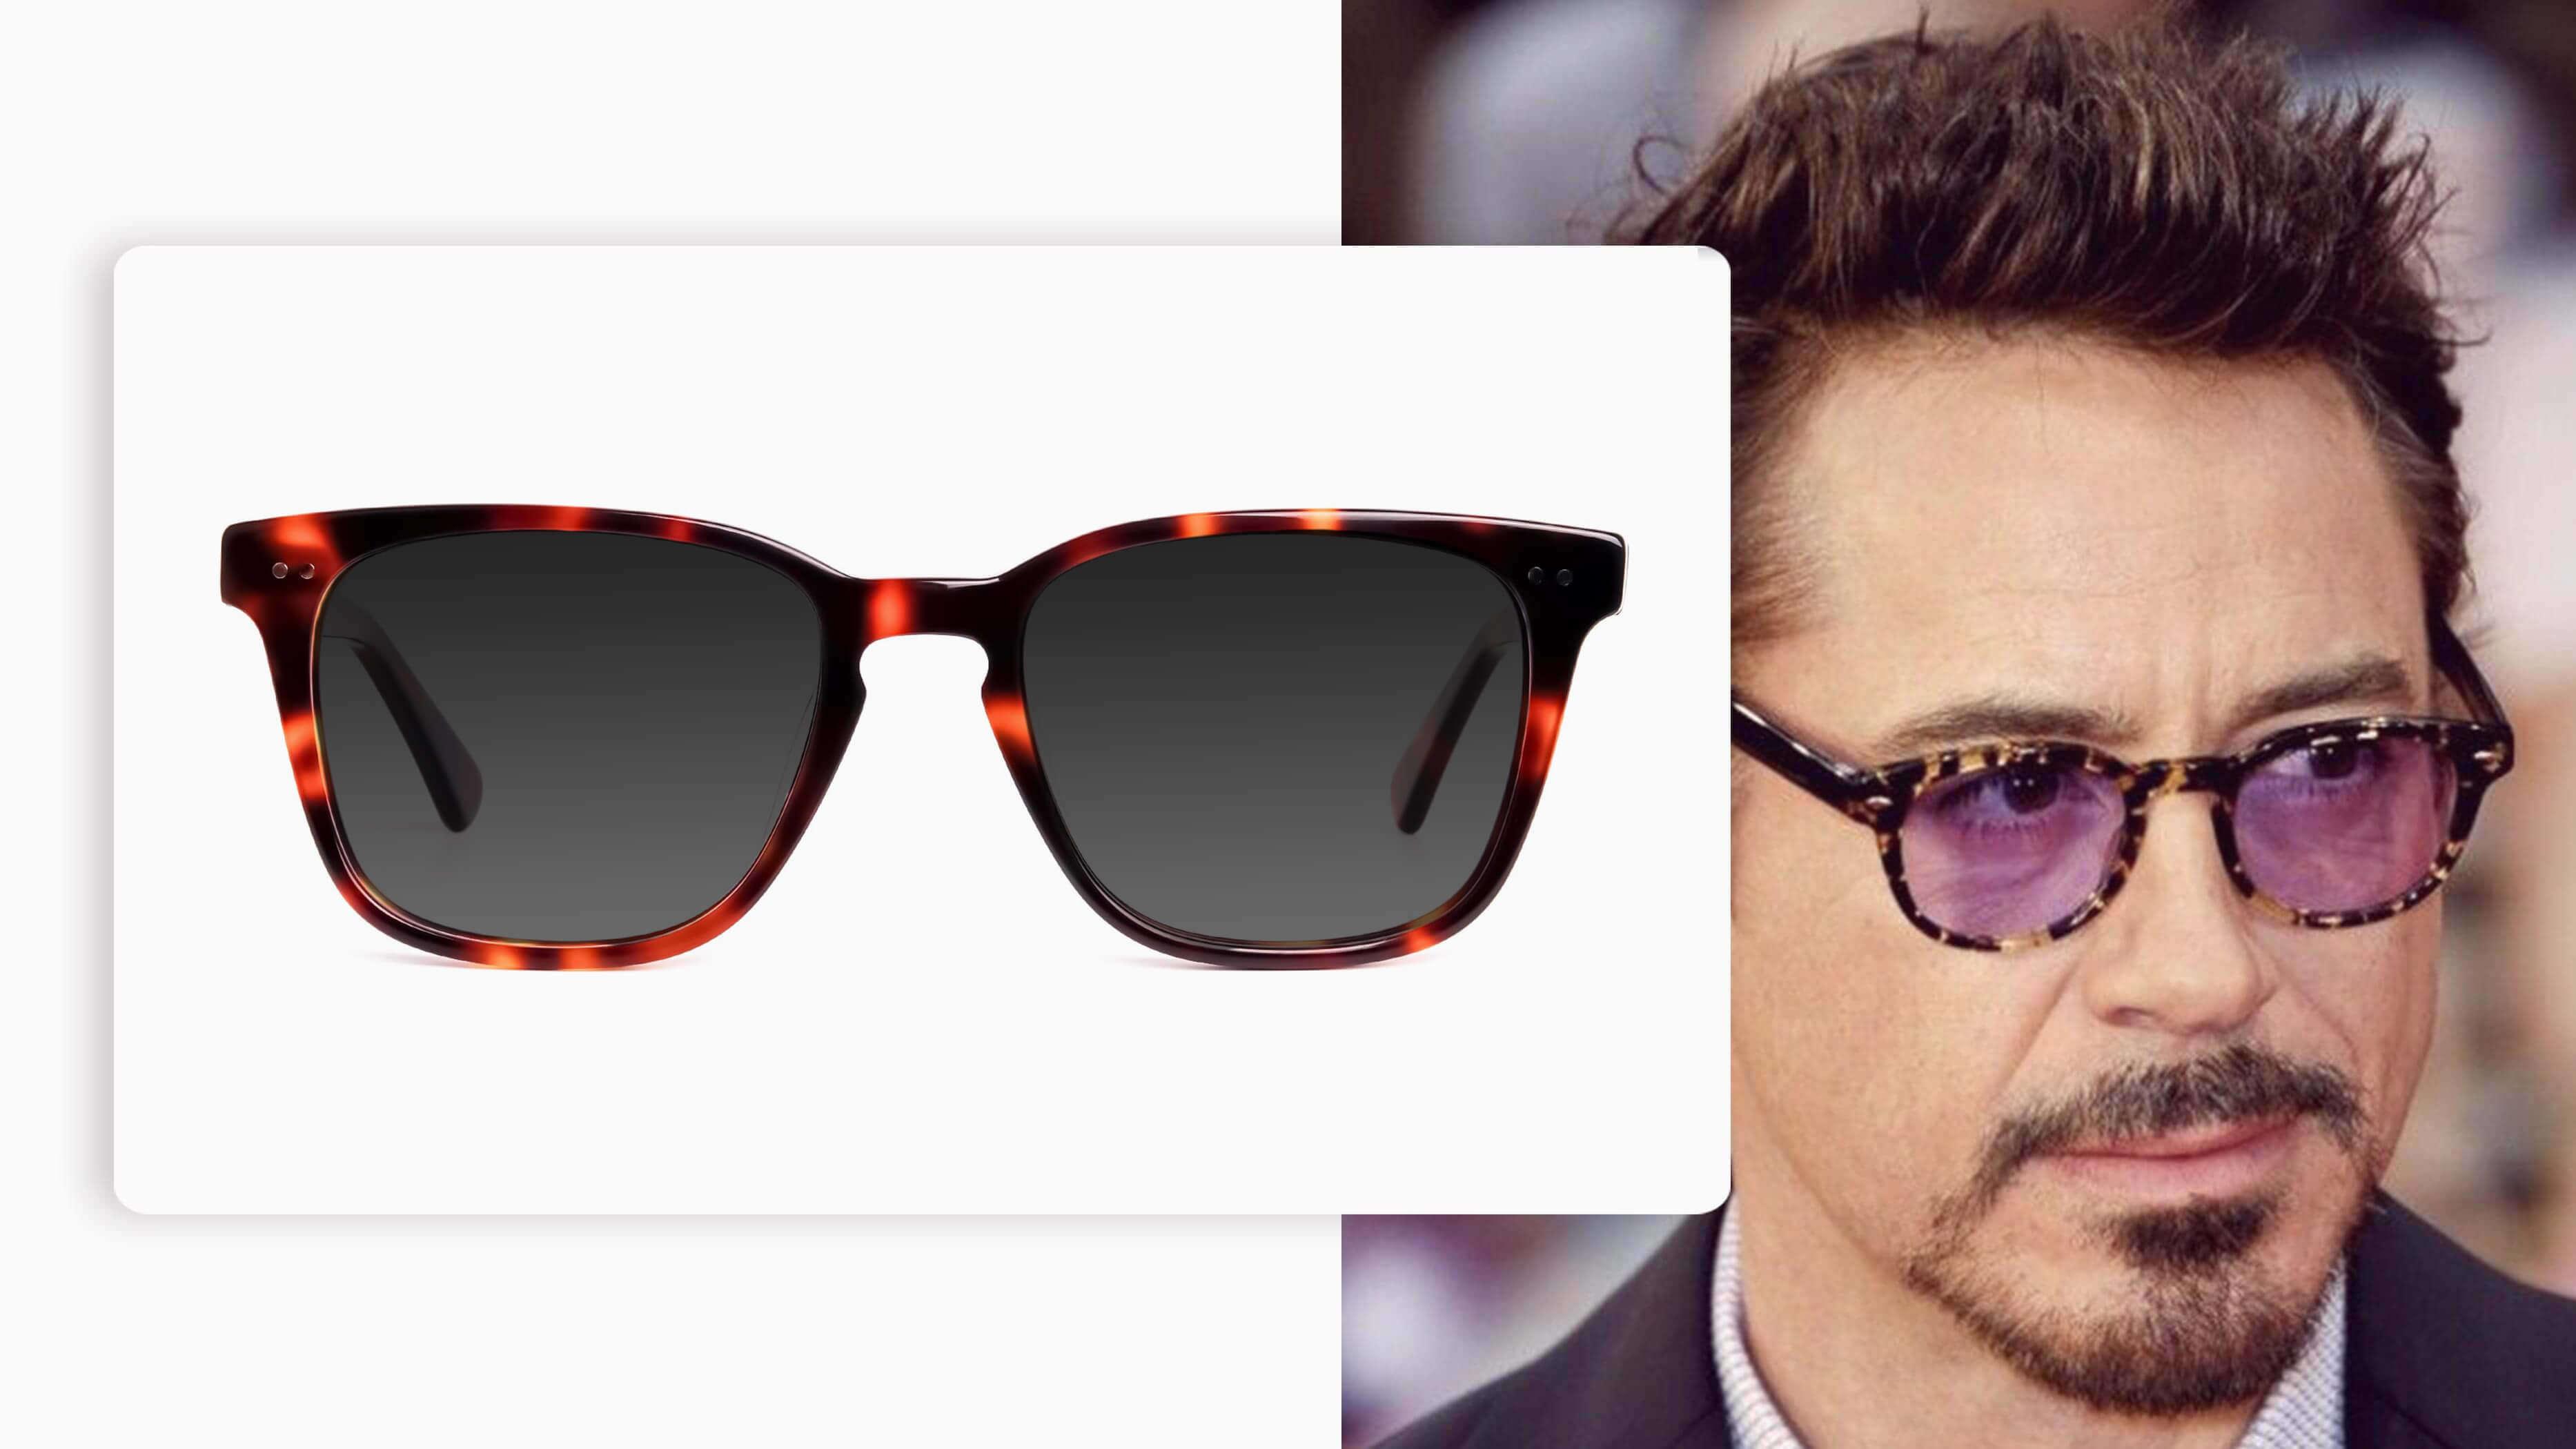 Oversized Square Sunglasses in Tortoiseshell